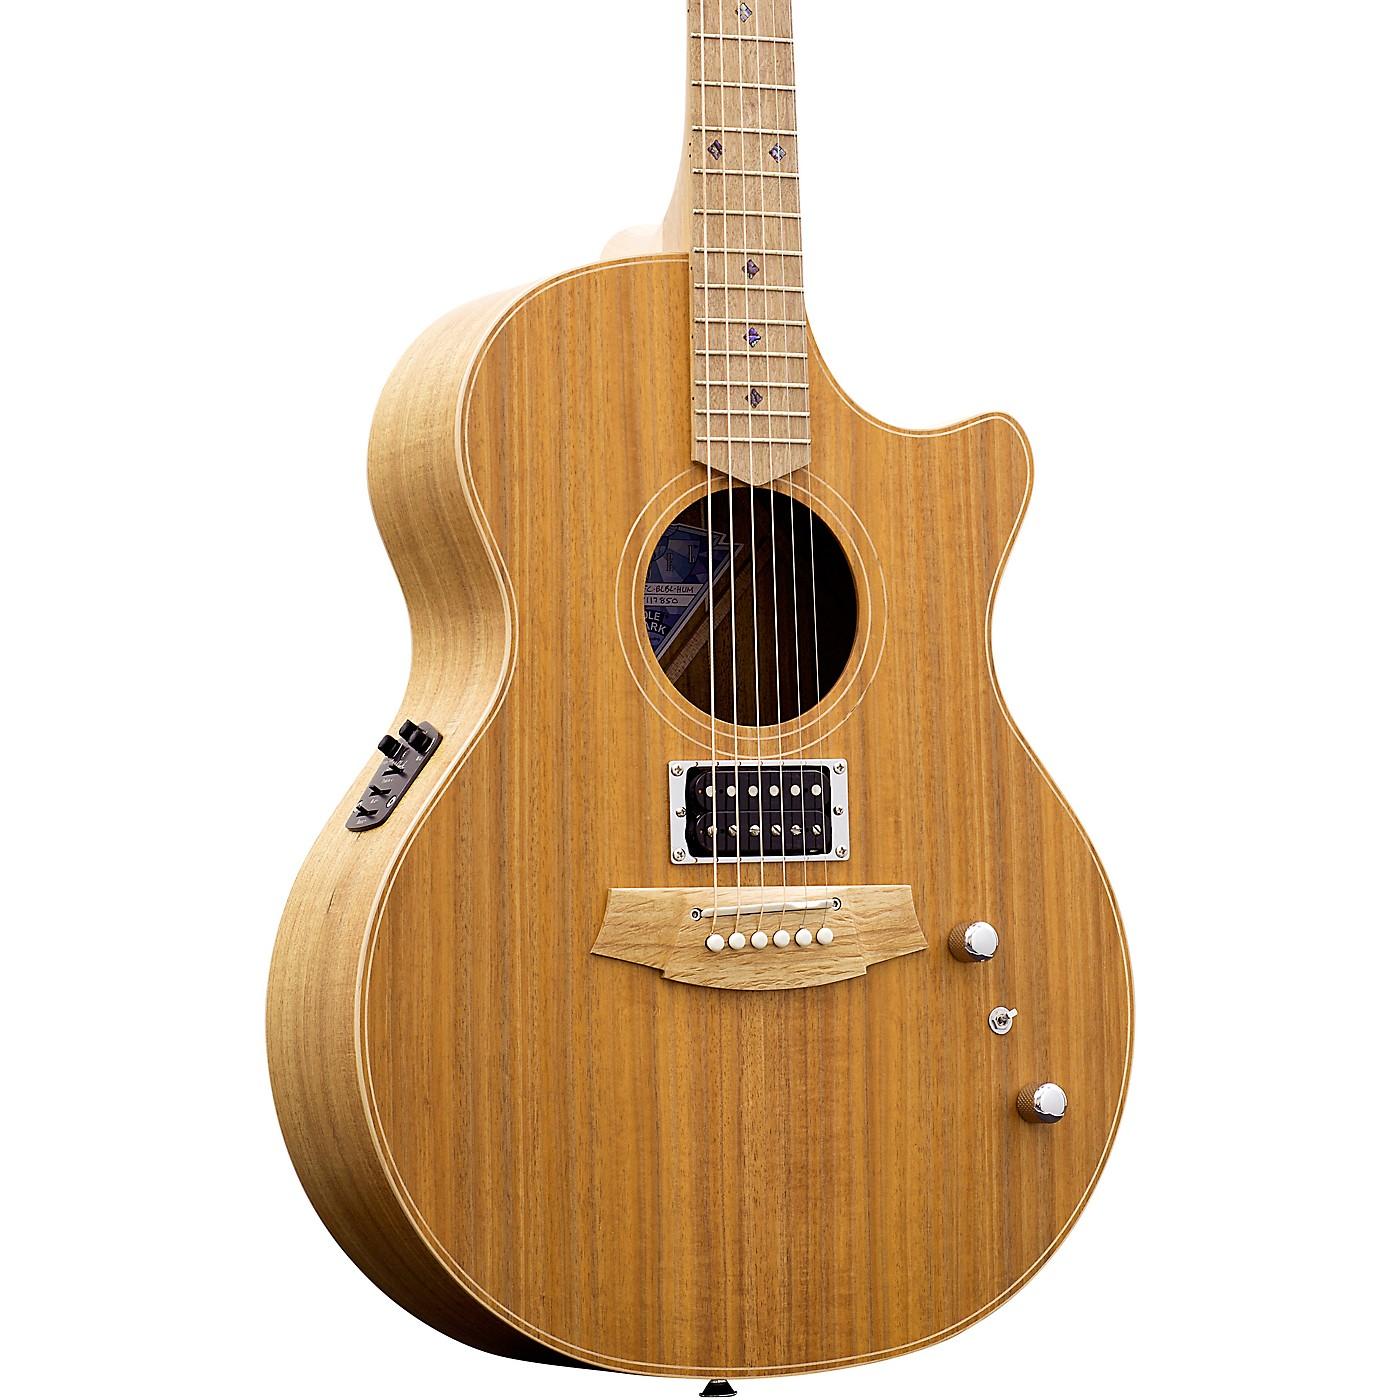 Cole Clark Angel 2 Series Australian Blackwood Grand Auditorium Humbucker Acoustic-Electric Guitar thumbnail